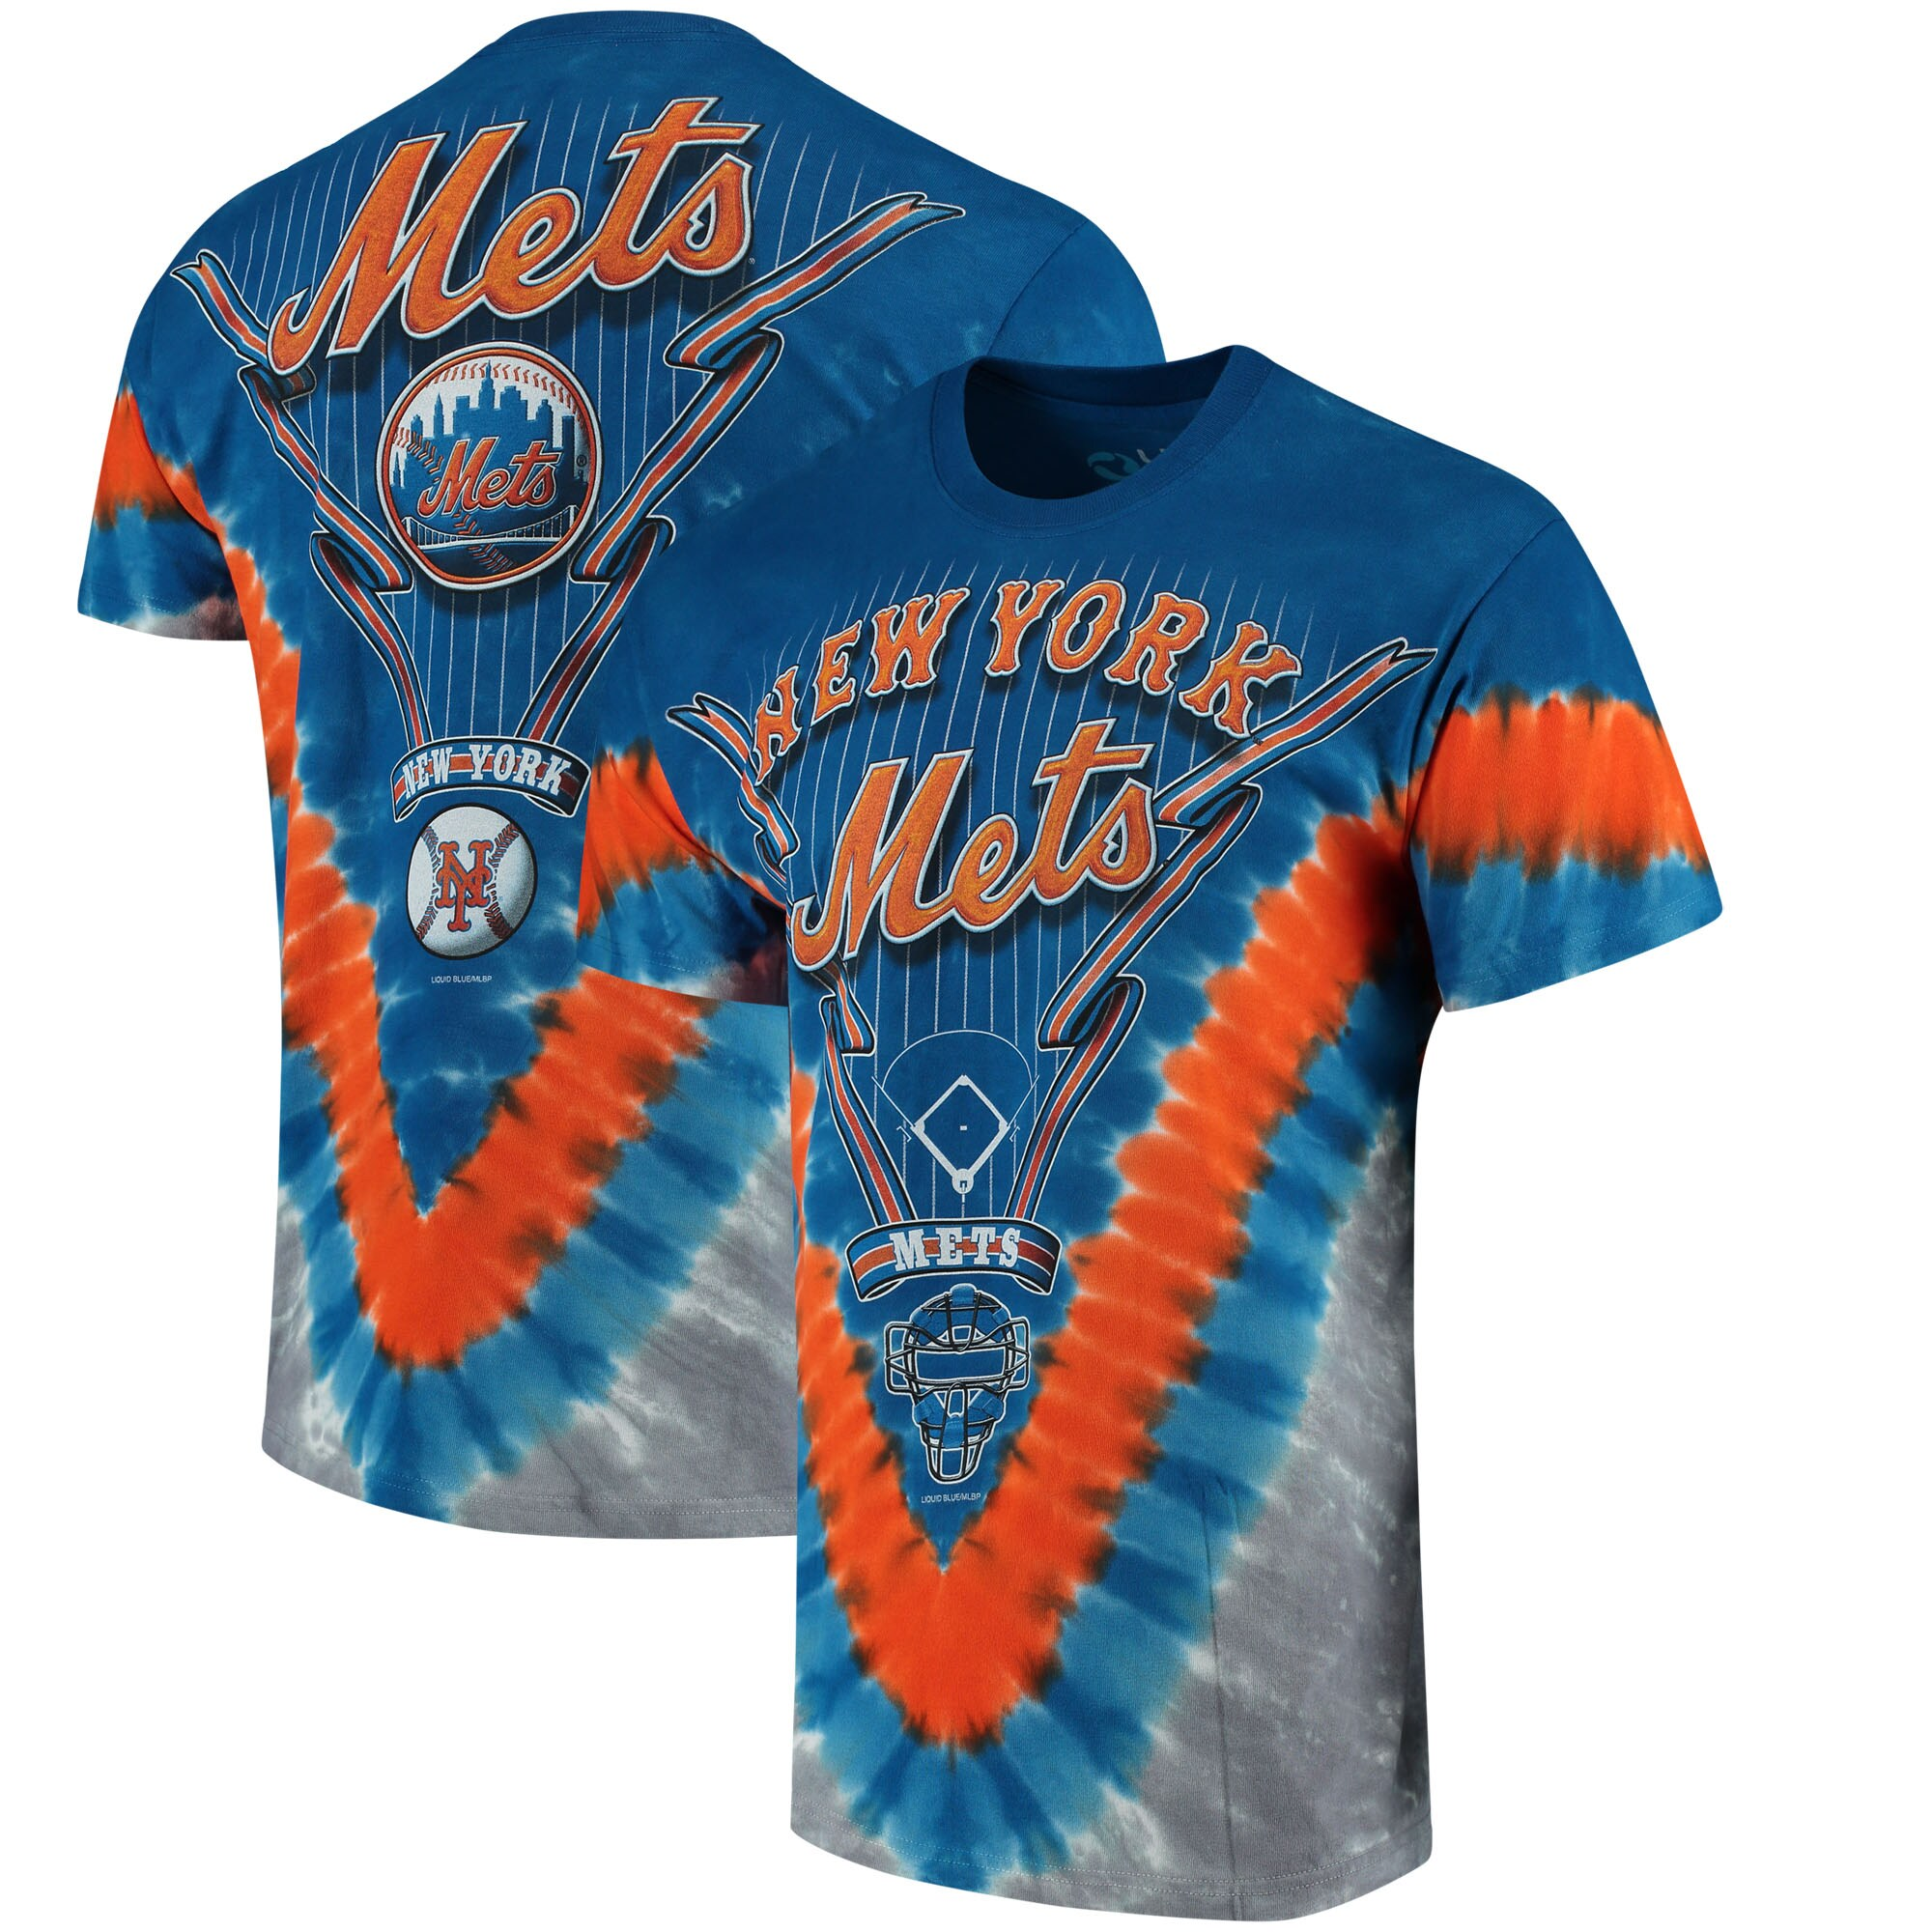 New York Mets Tie-Dye T-Shirt - Royal Blue